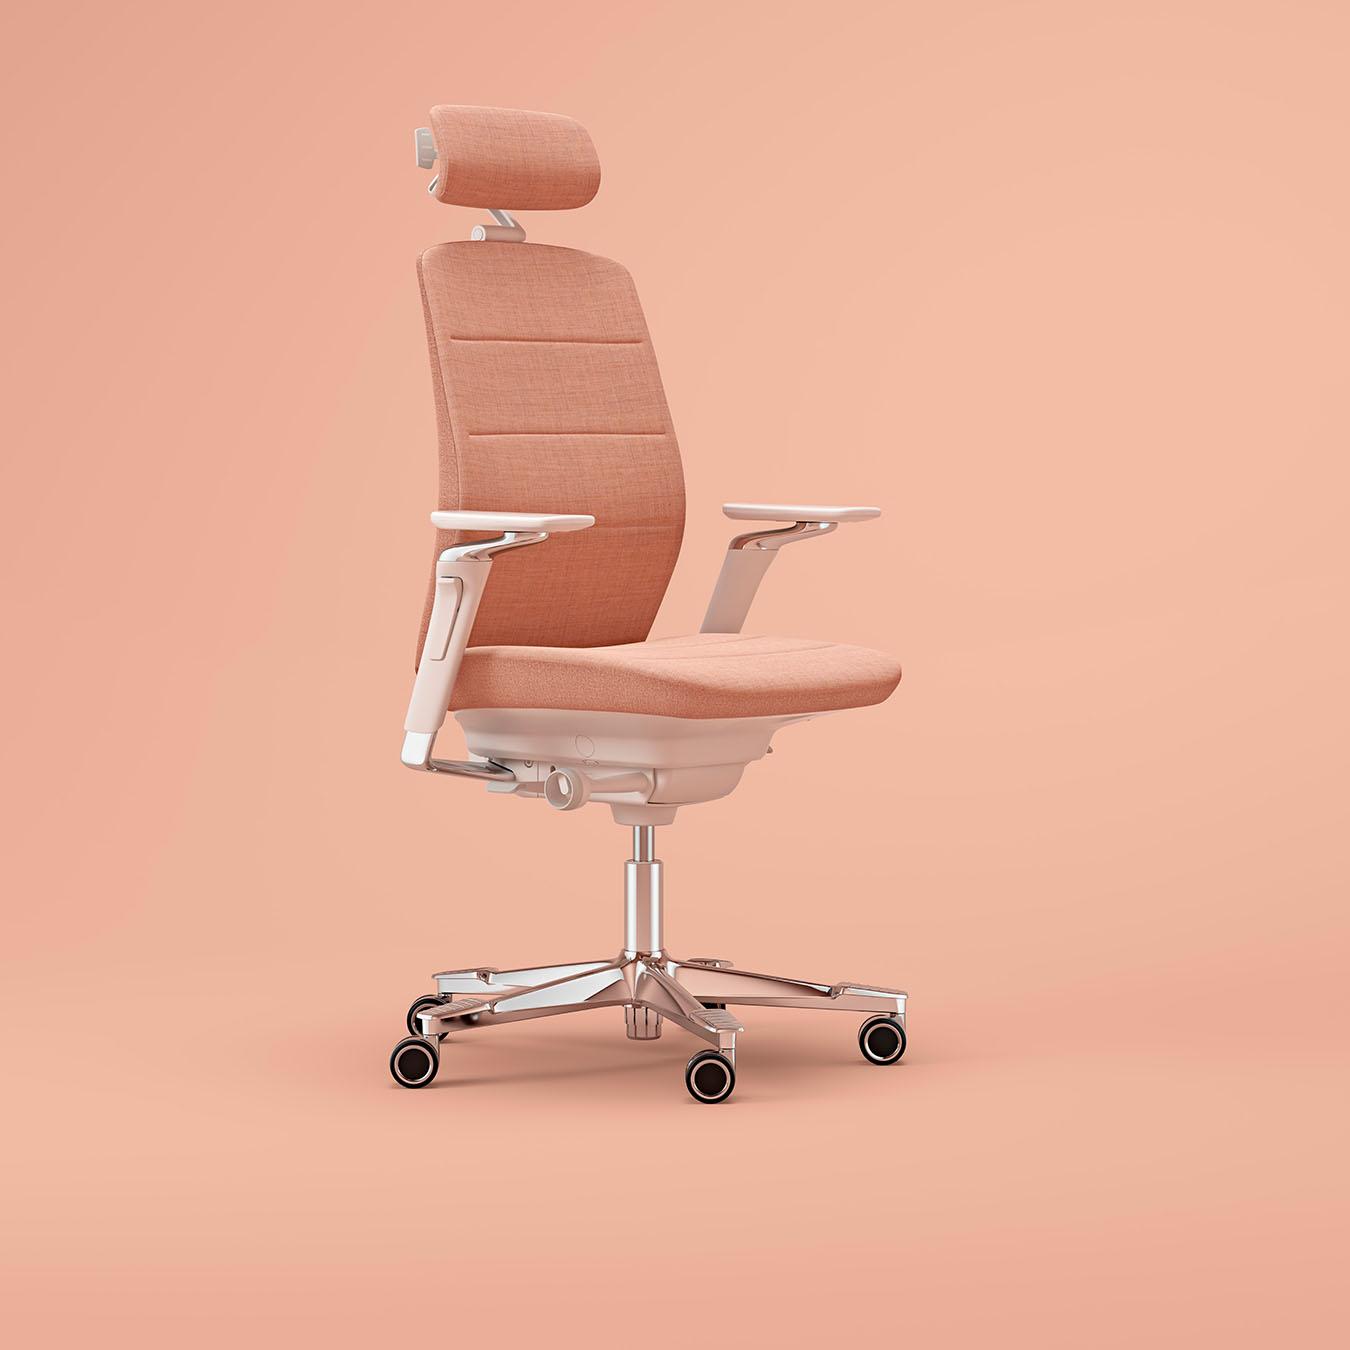 Kinnarps Swedish Made Office Furniture Since 1942